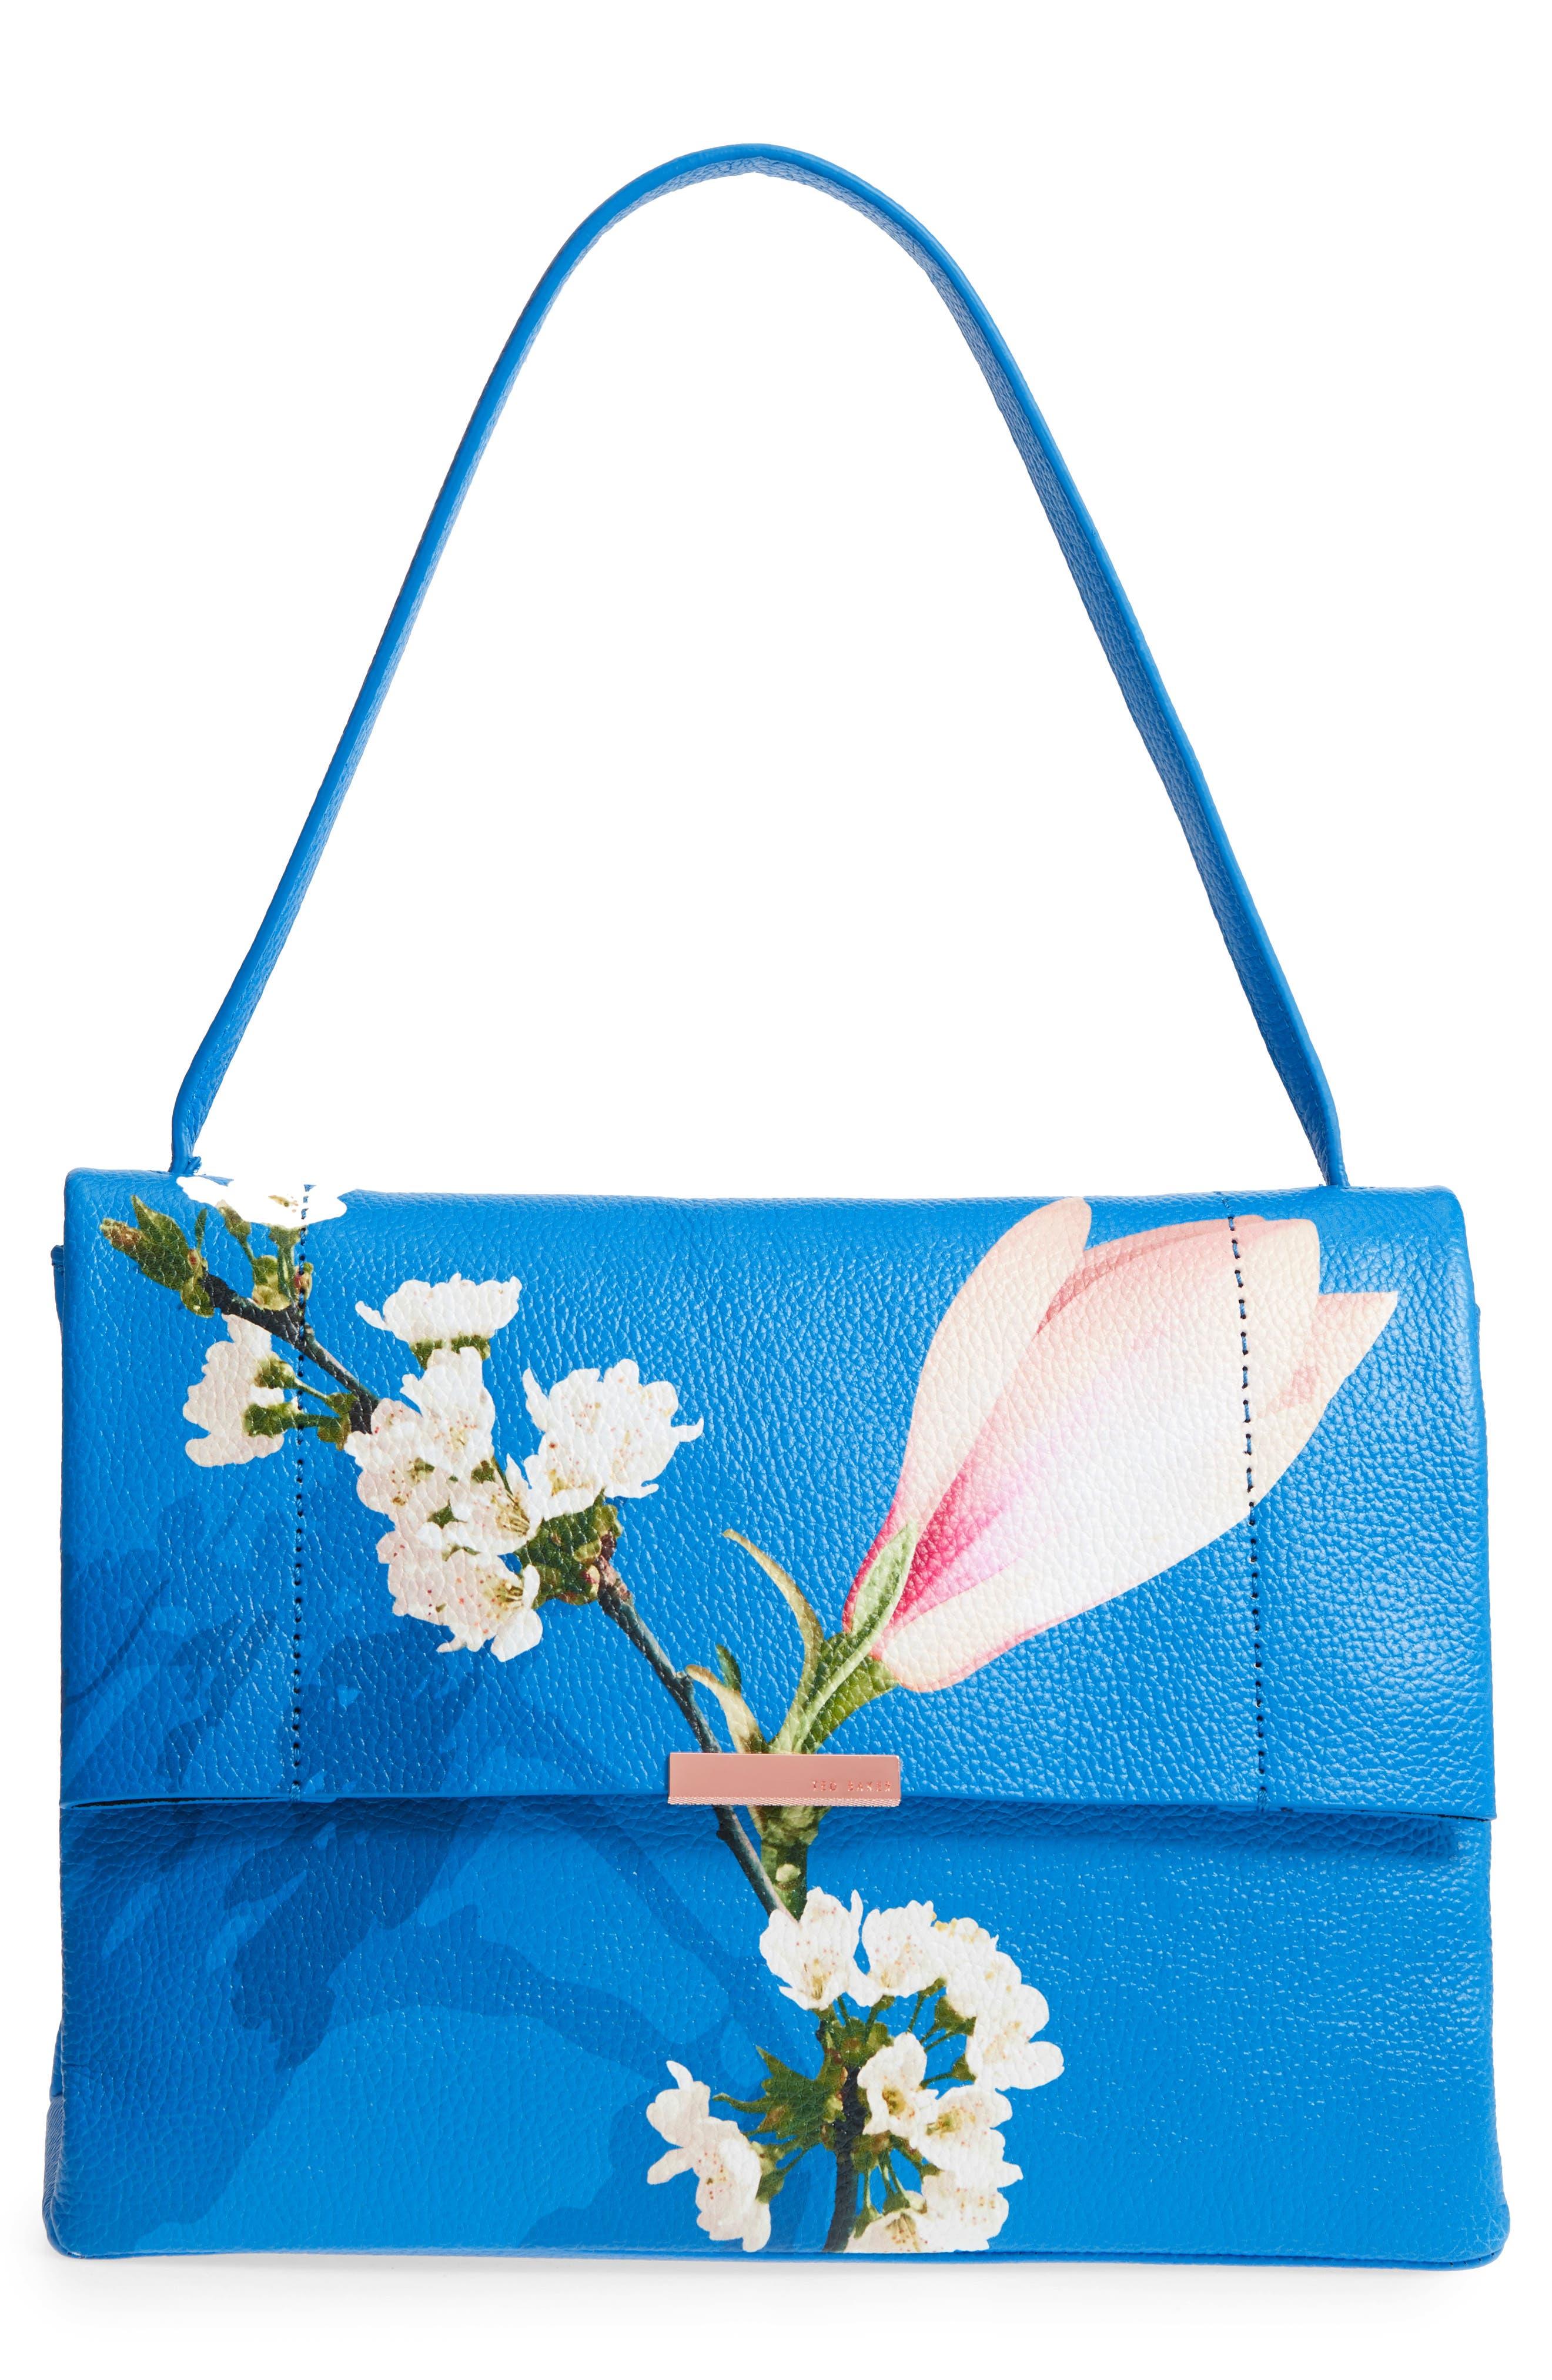 Heeidi Harmony Print Leather Shoulder Bag,                             Main thumbnail 1, color,                             Bright Blue